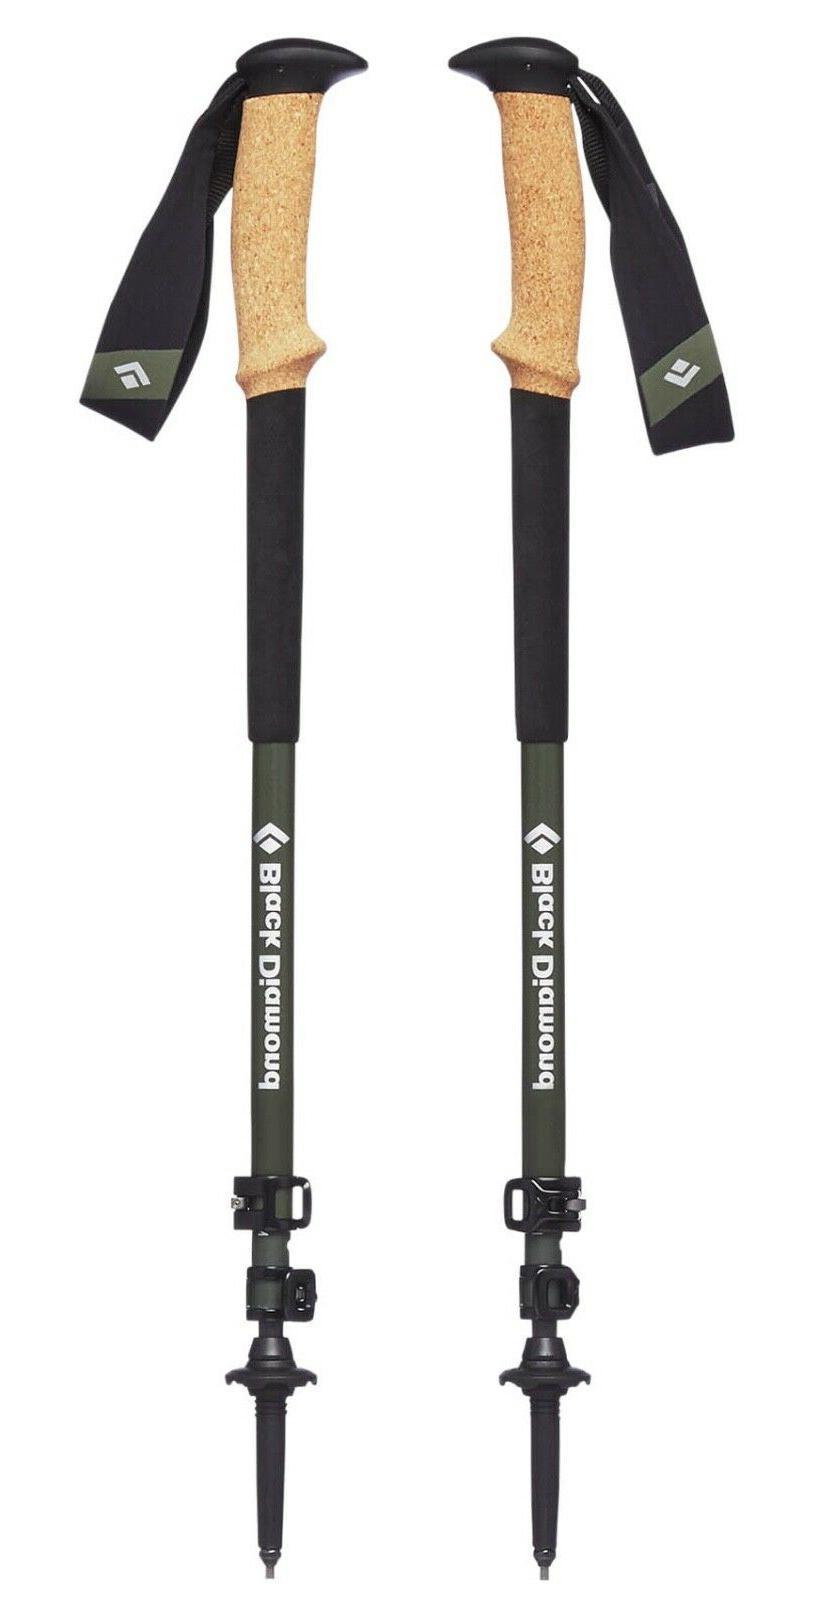 2019 Diamond Alpine Carbon Trekking Poles+Tip Protectors+Snow Baskets